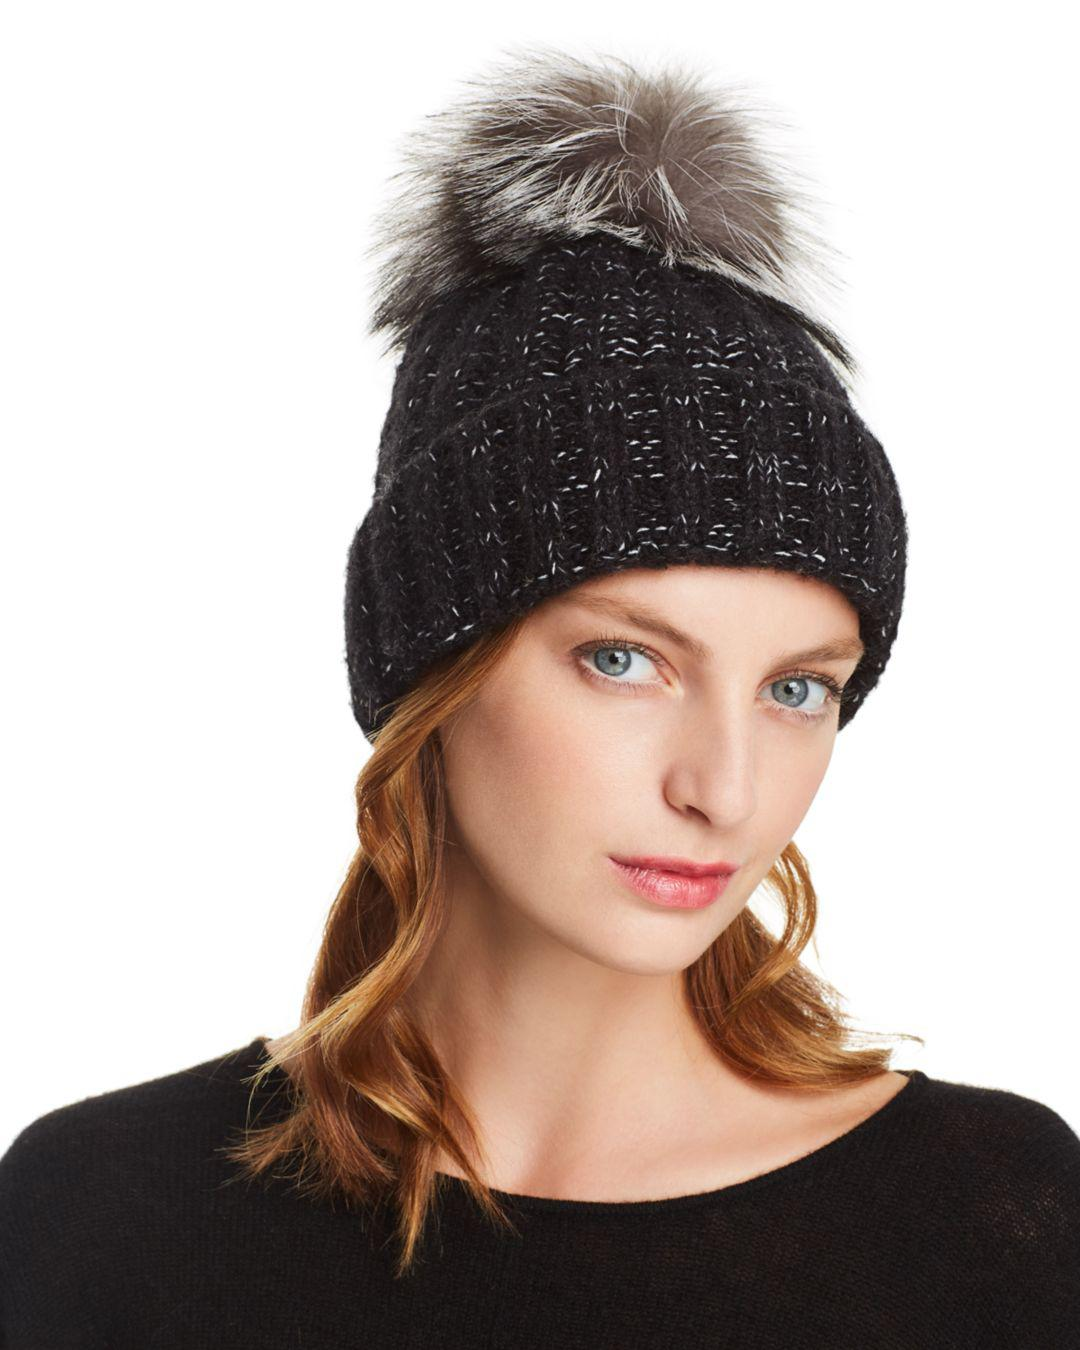 Kyi Kyi Fox Fur Pom-pom Rib-knit Beanie in Black - Lyst 99f61ee93da8